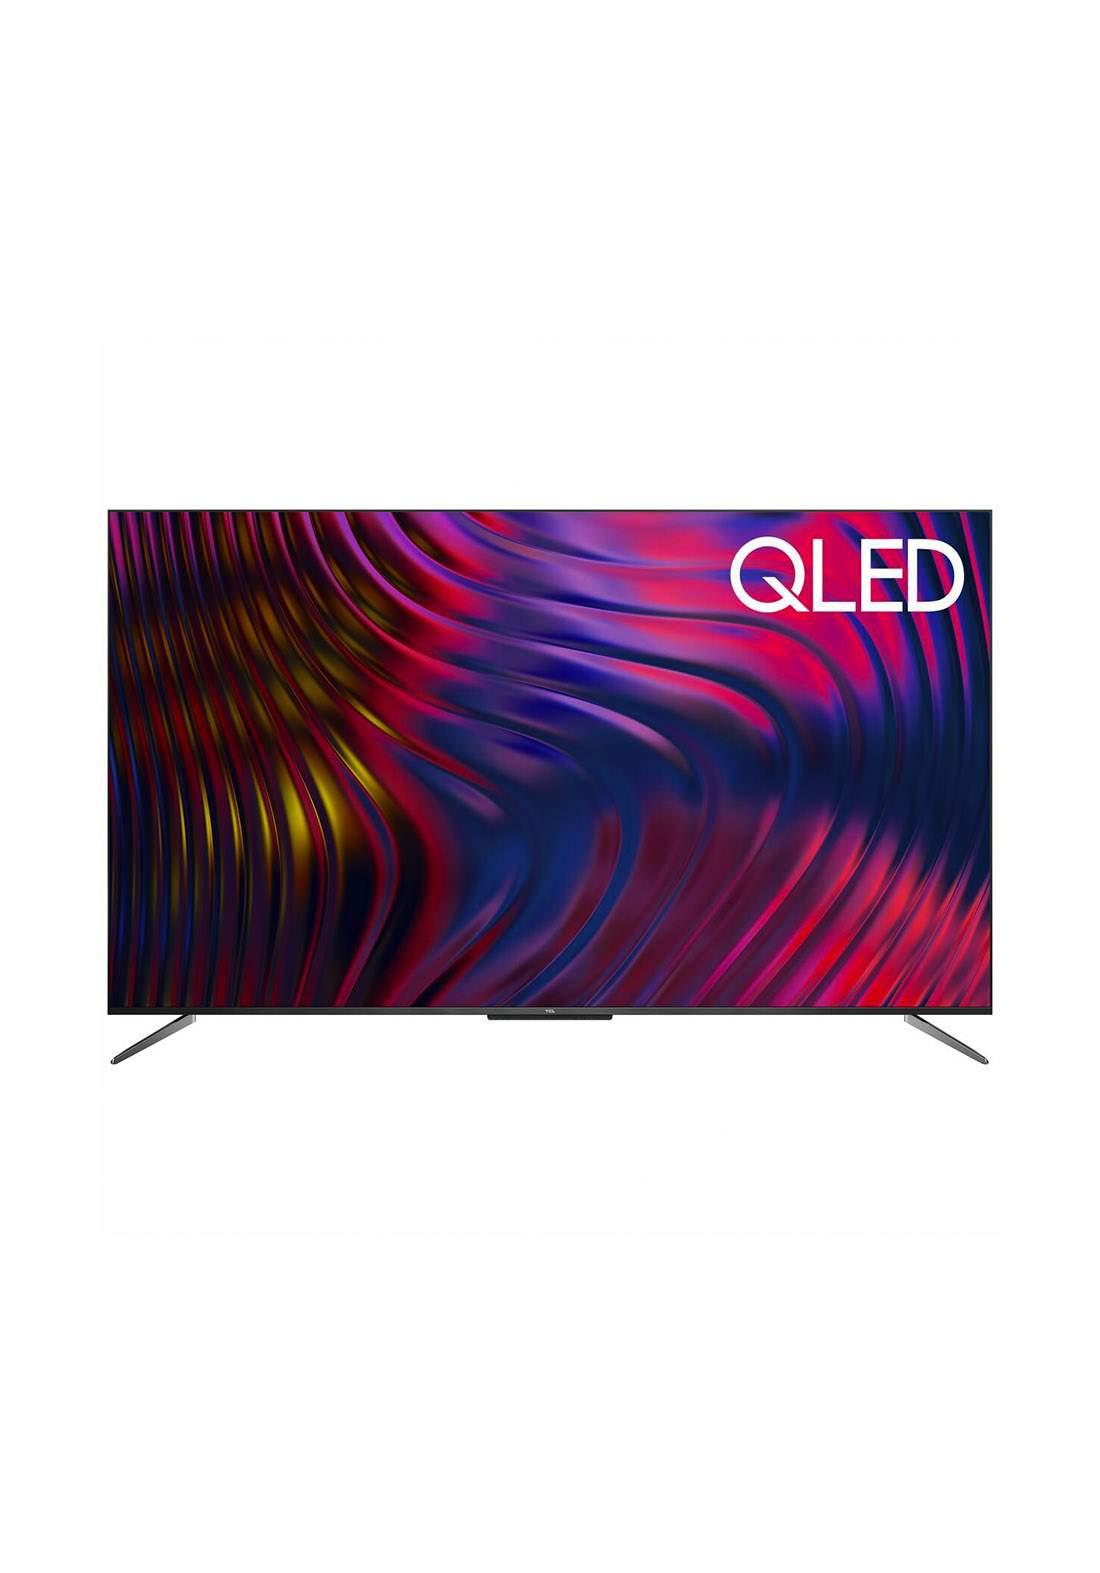 TCL  55C715   4K UHD HDR Android Smart QLED TV- Black  شاشة